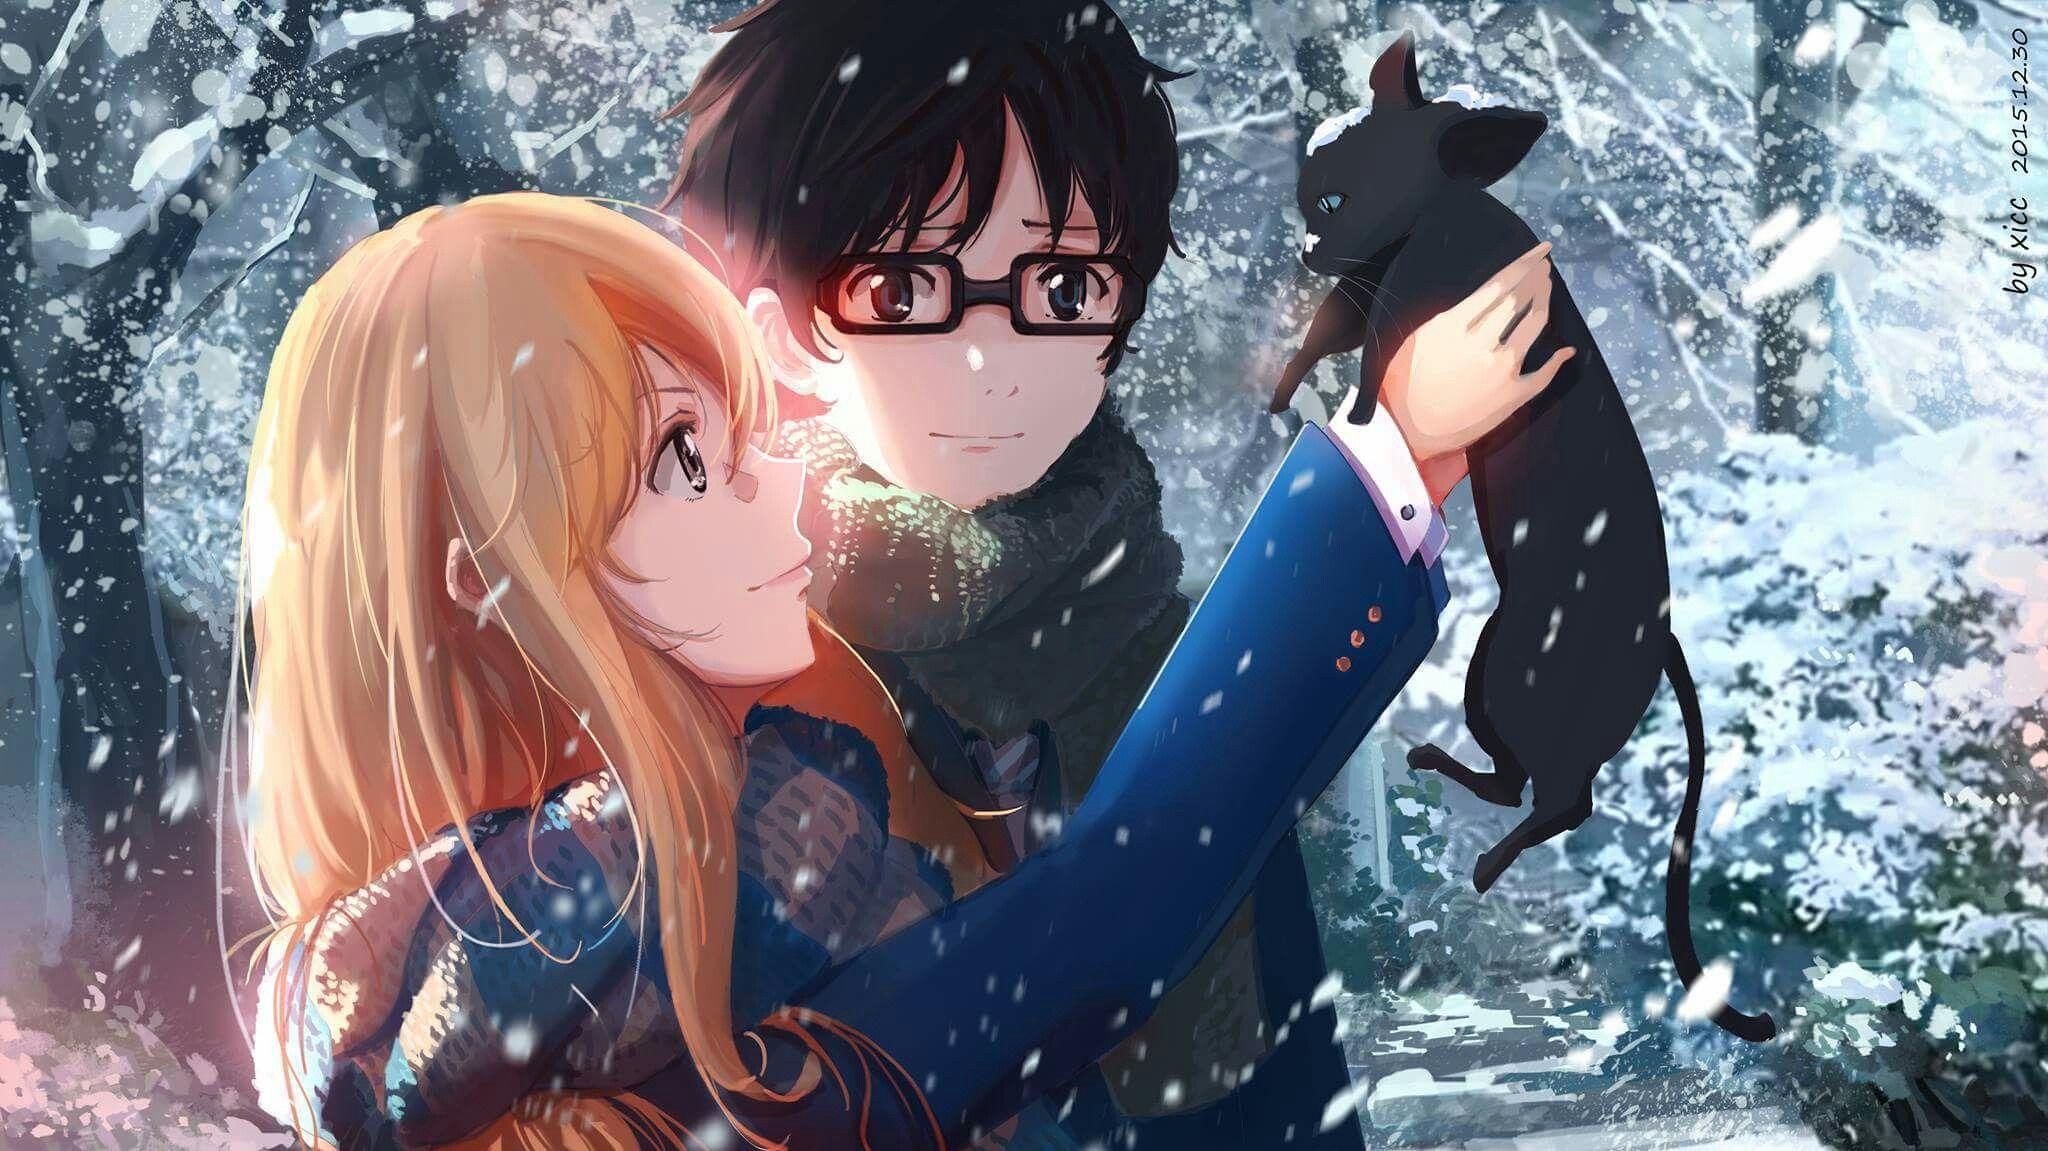 Pin oleh Lux Arcadia di Random Anime Pict Gambar anime